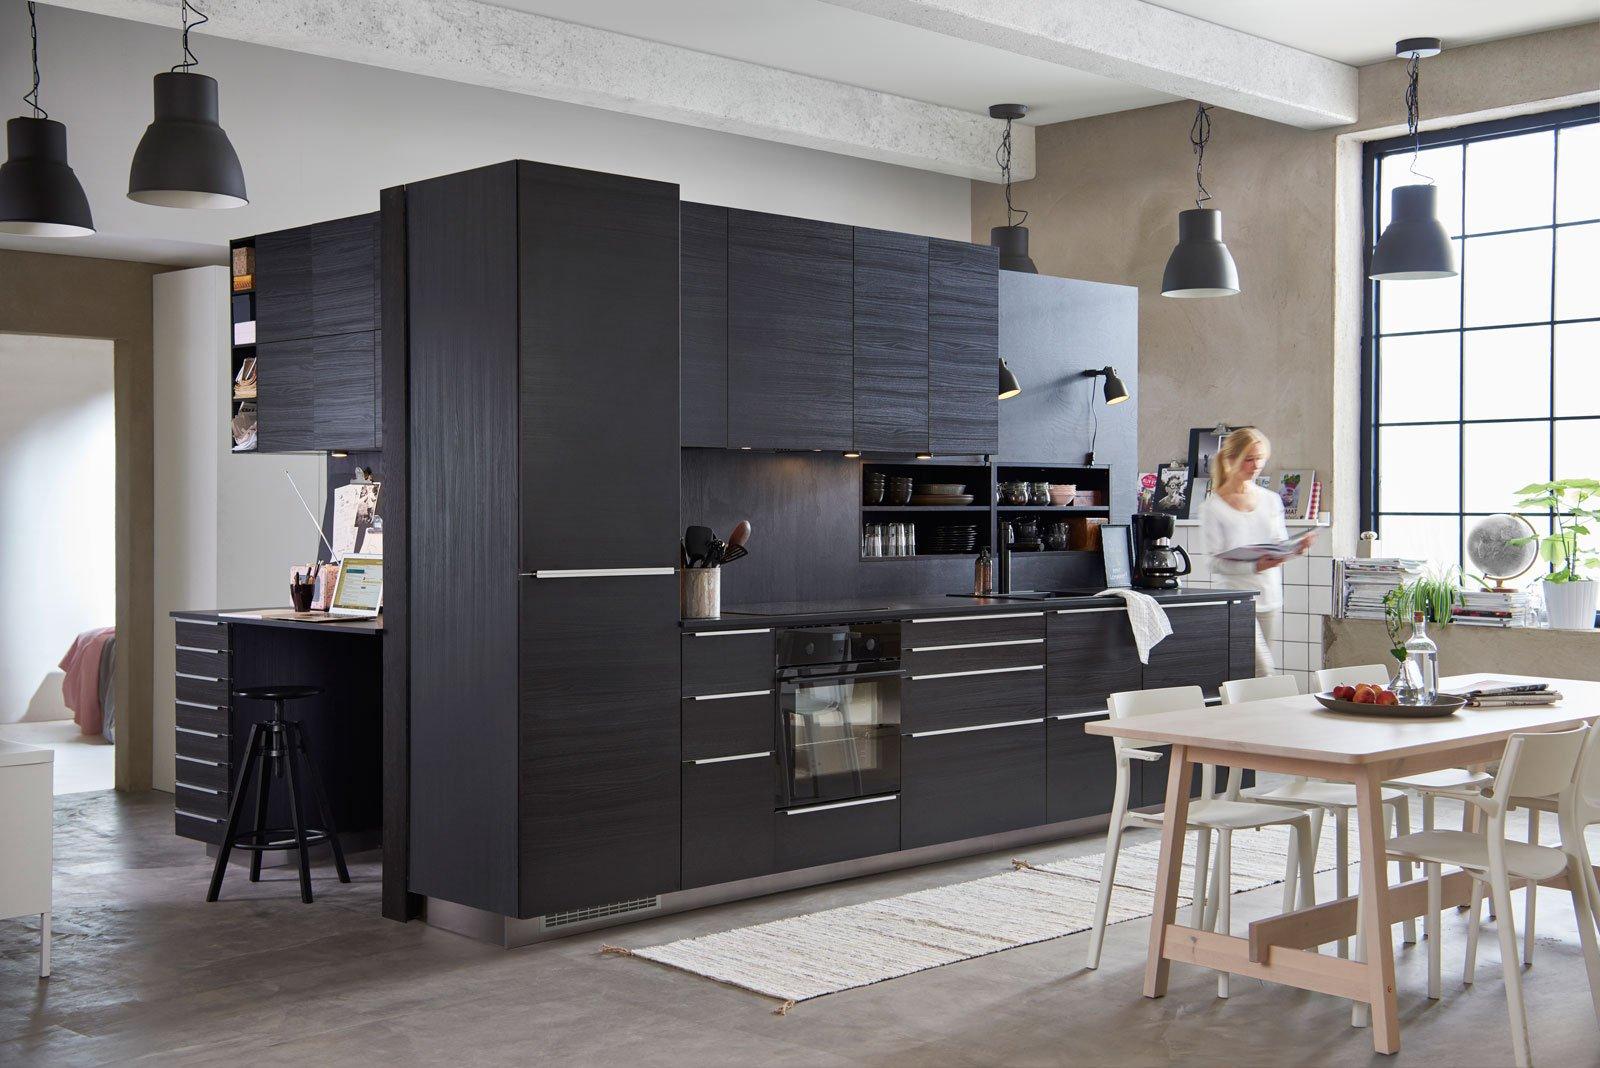 Best Costo Cucina Ikea Contemporary - bakeroffroad.us ...